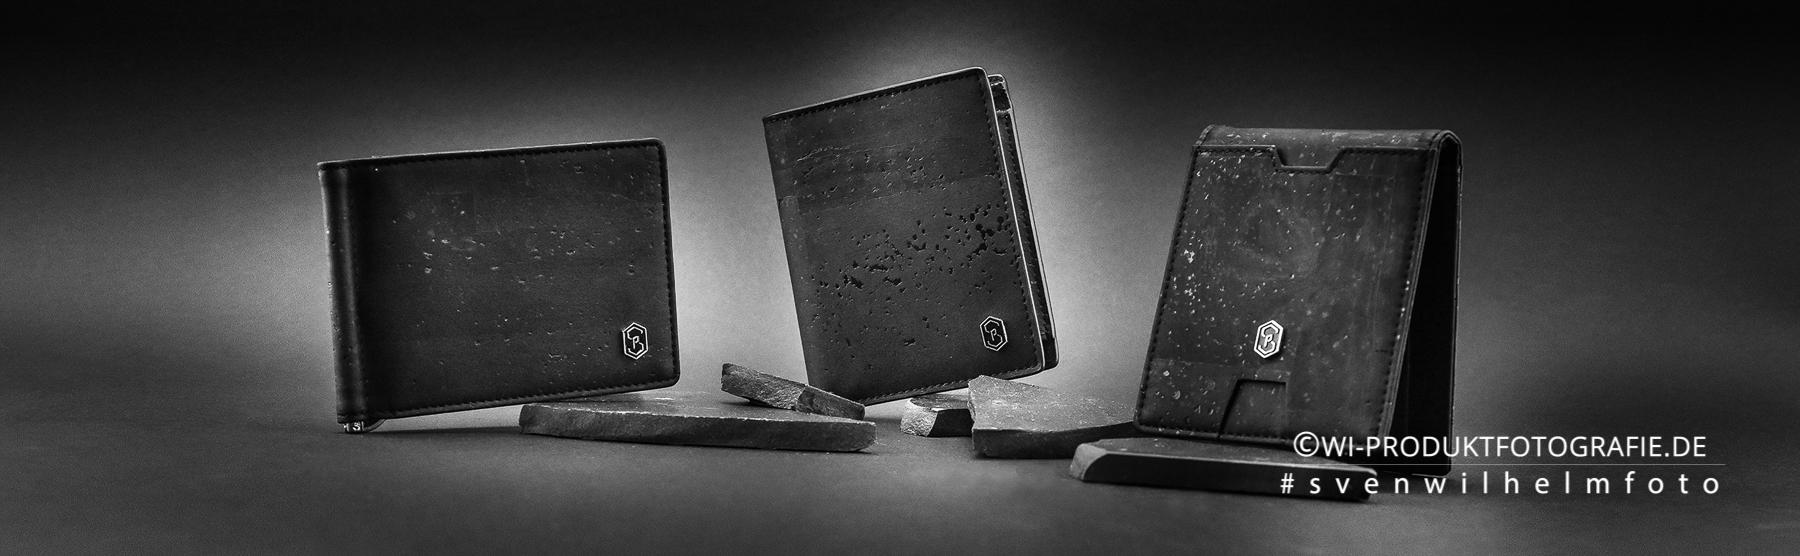 DAS PRODUKTFOTO Slim Wallets Produktfotos Anbieter Professionell